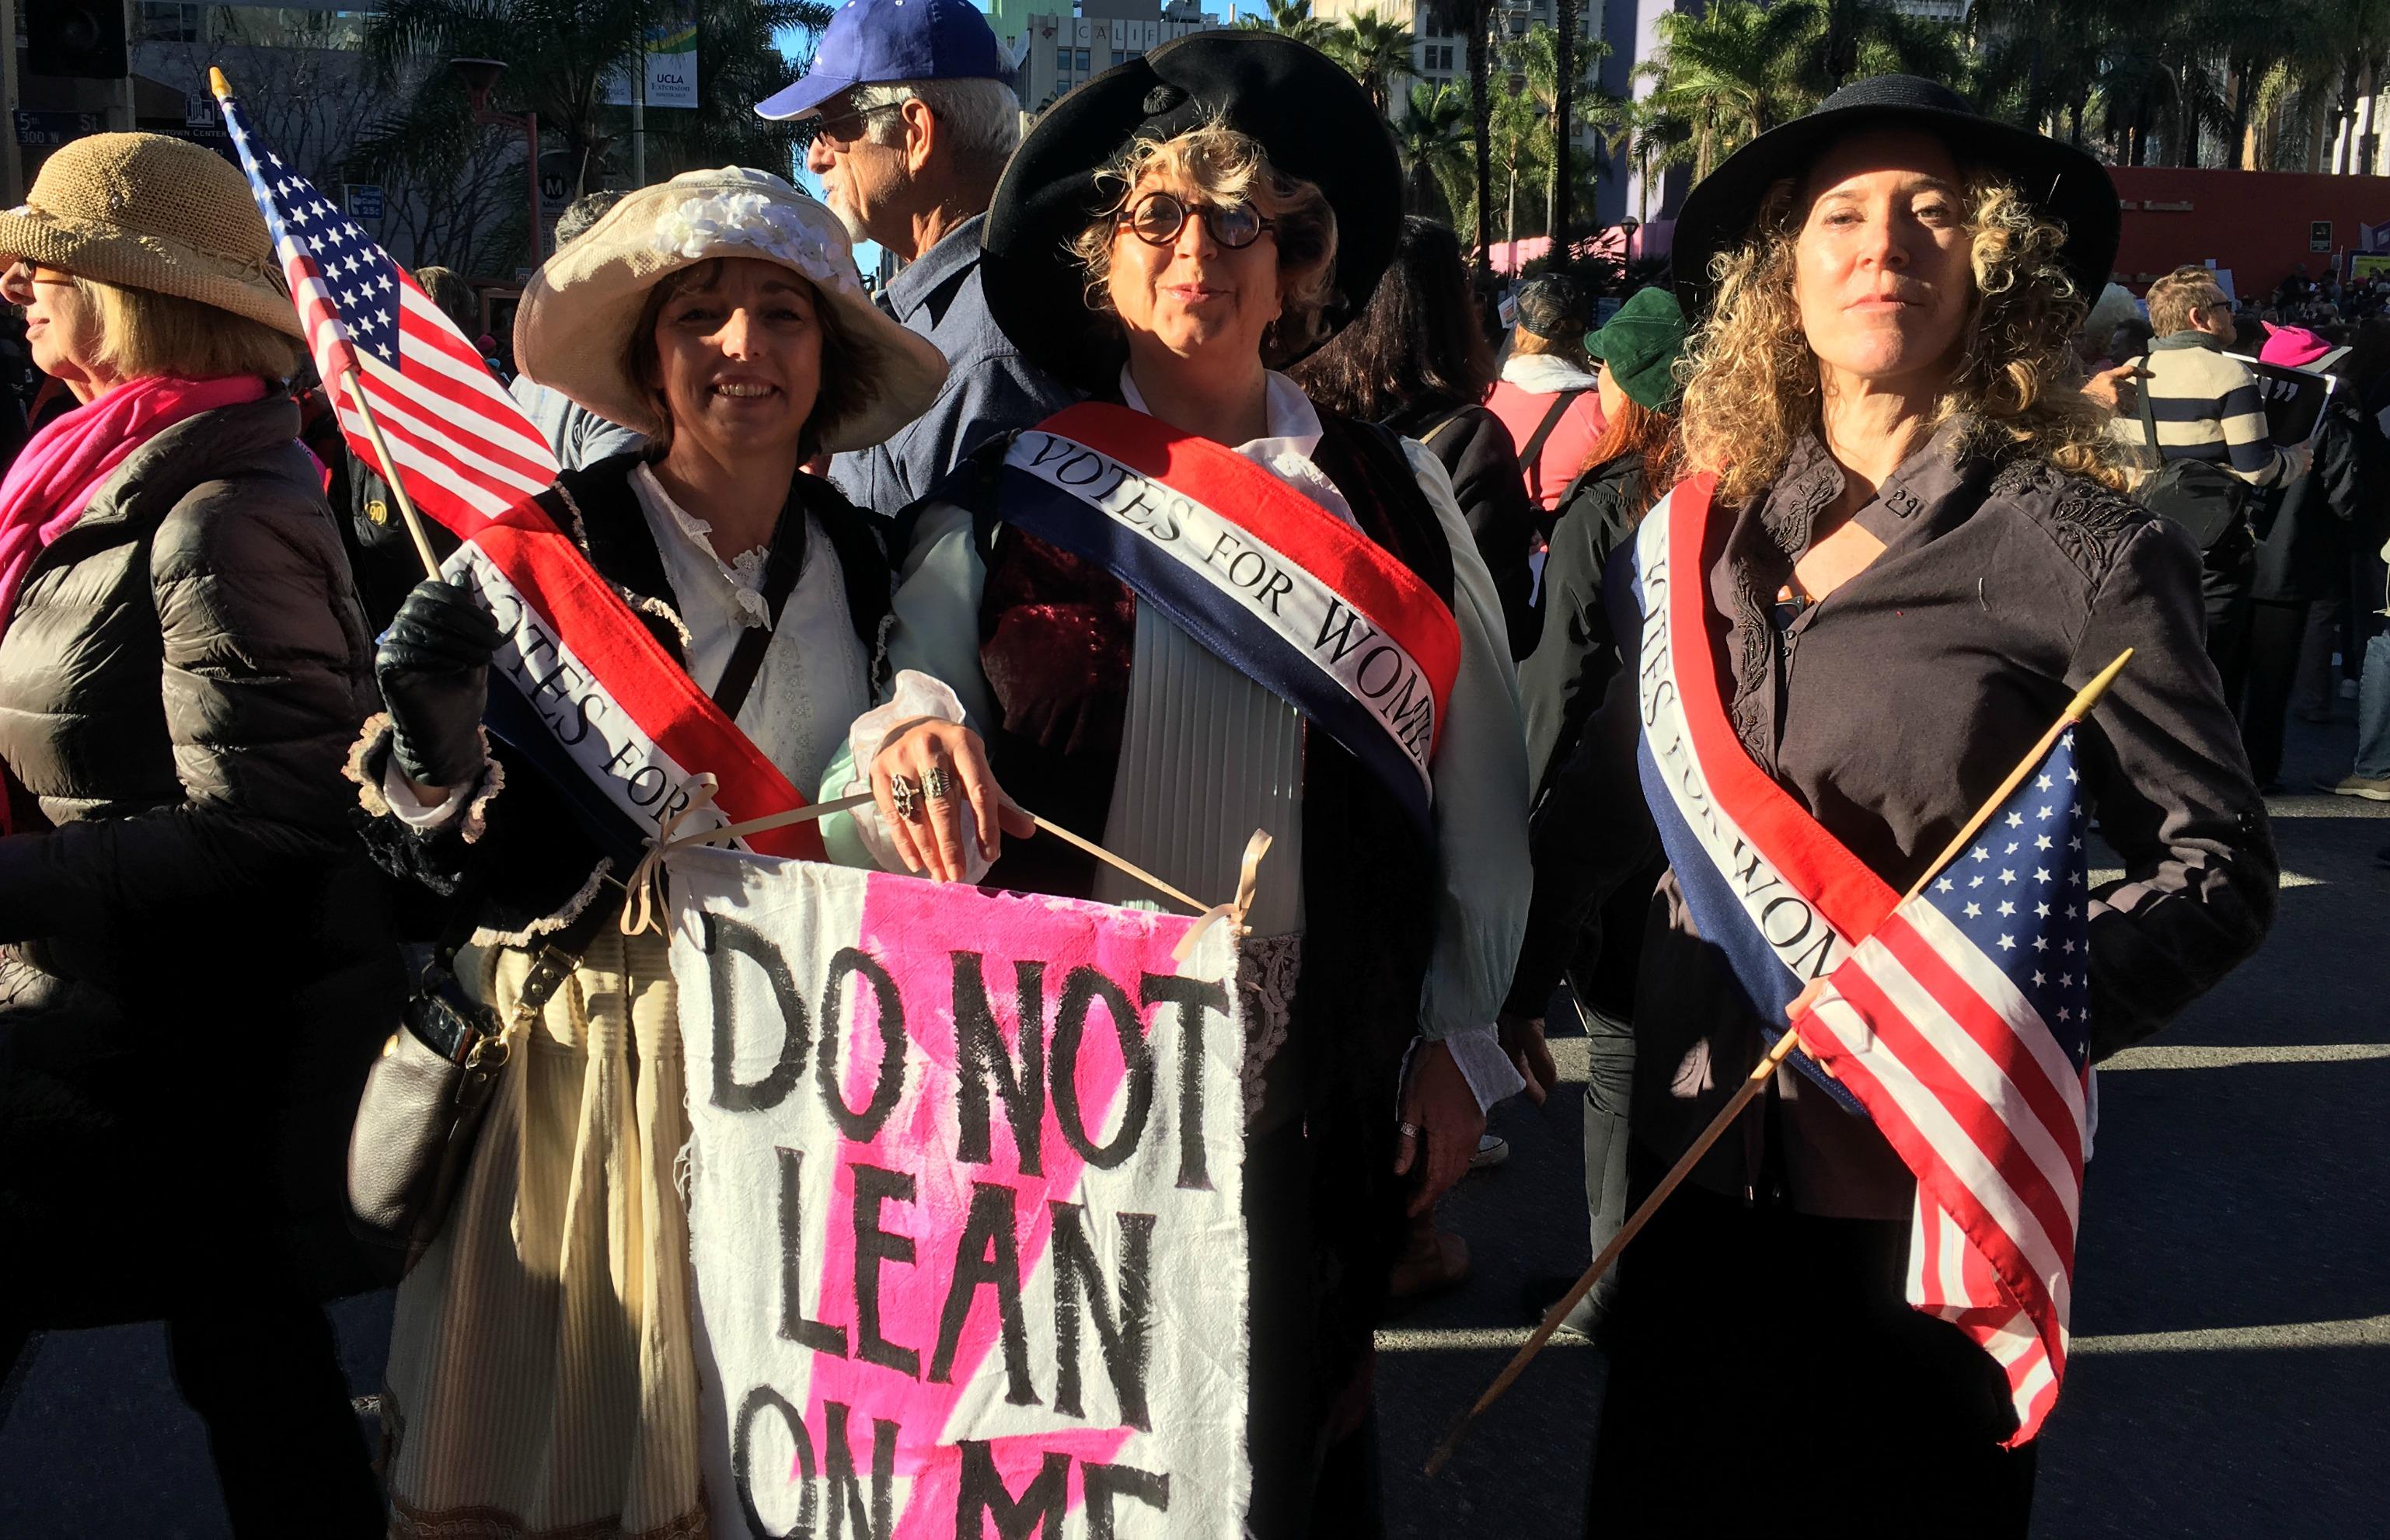 2017_women_march_DONT_LEAN_ON_ME-3.jpg